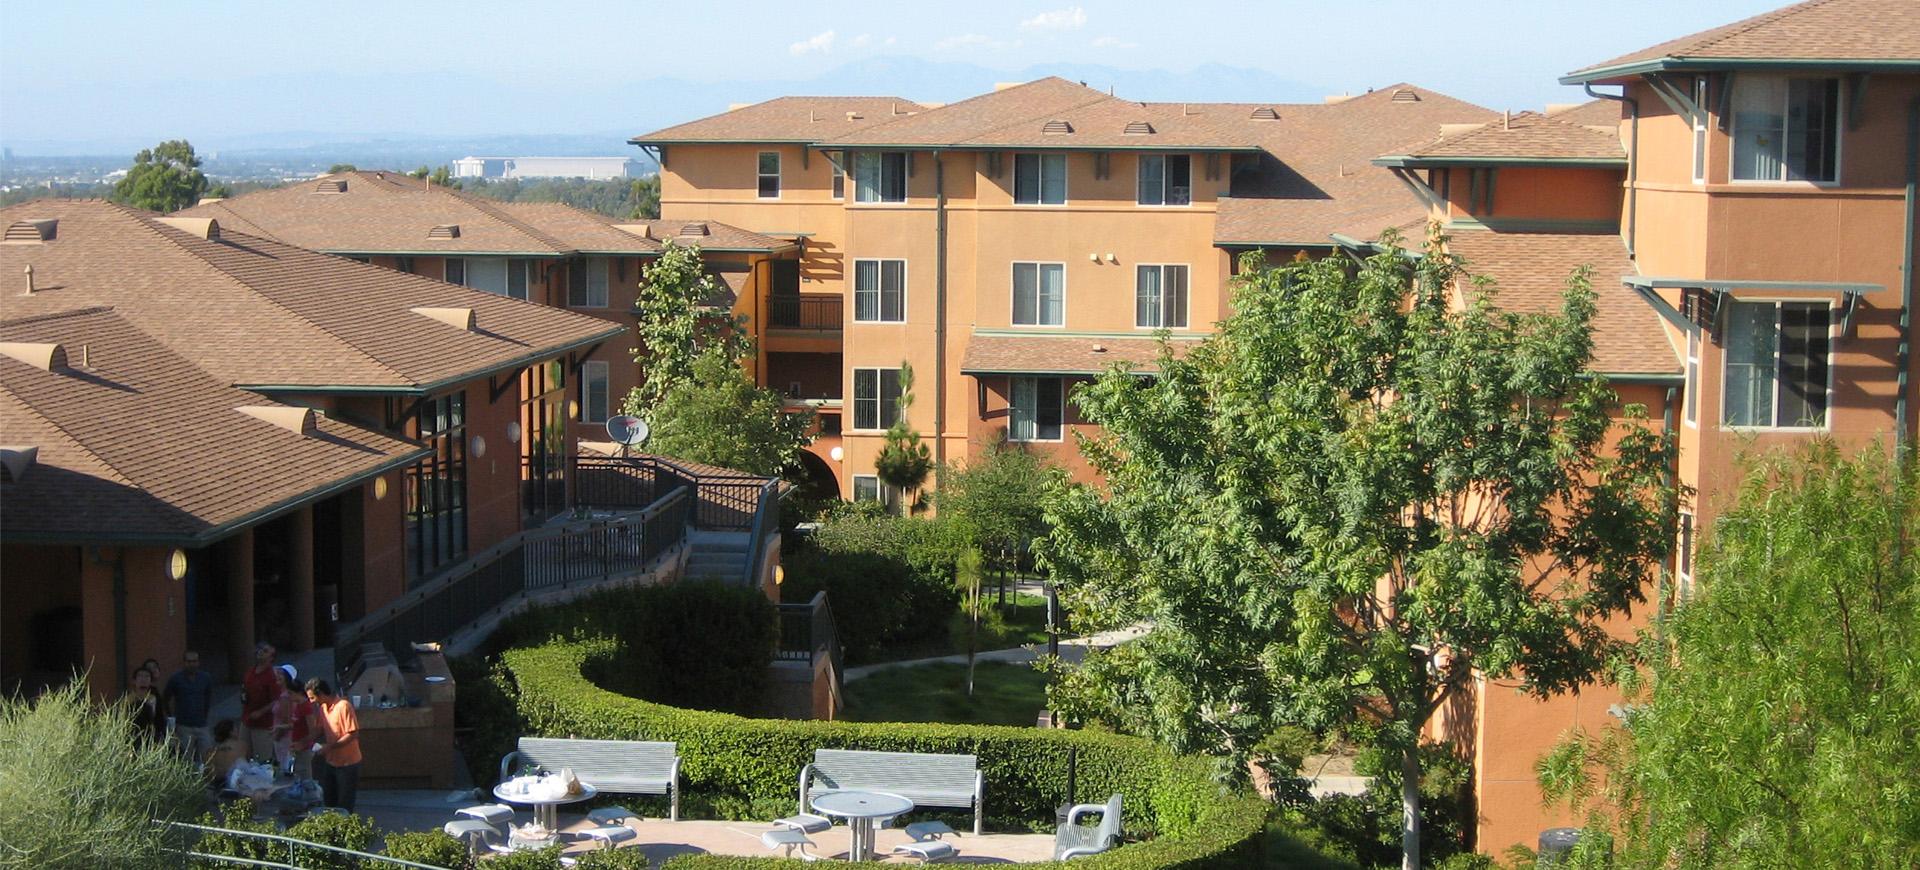 Palo Verde II_Banner Image 2